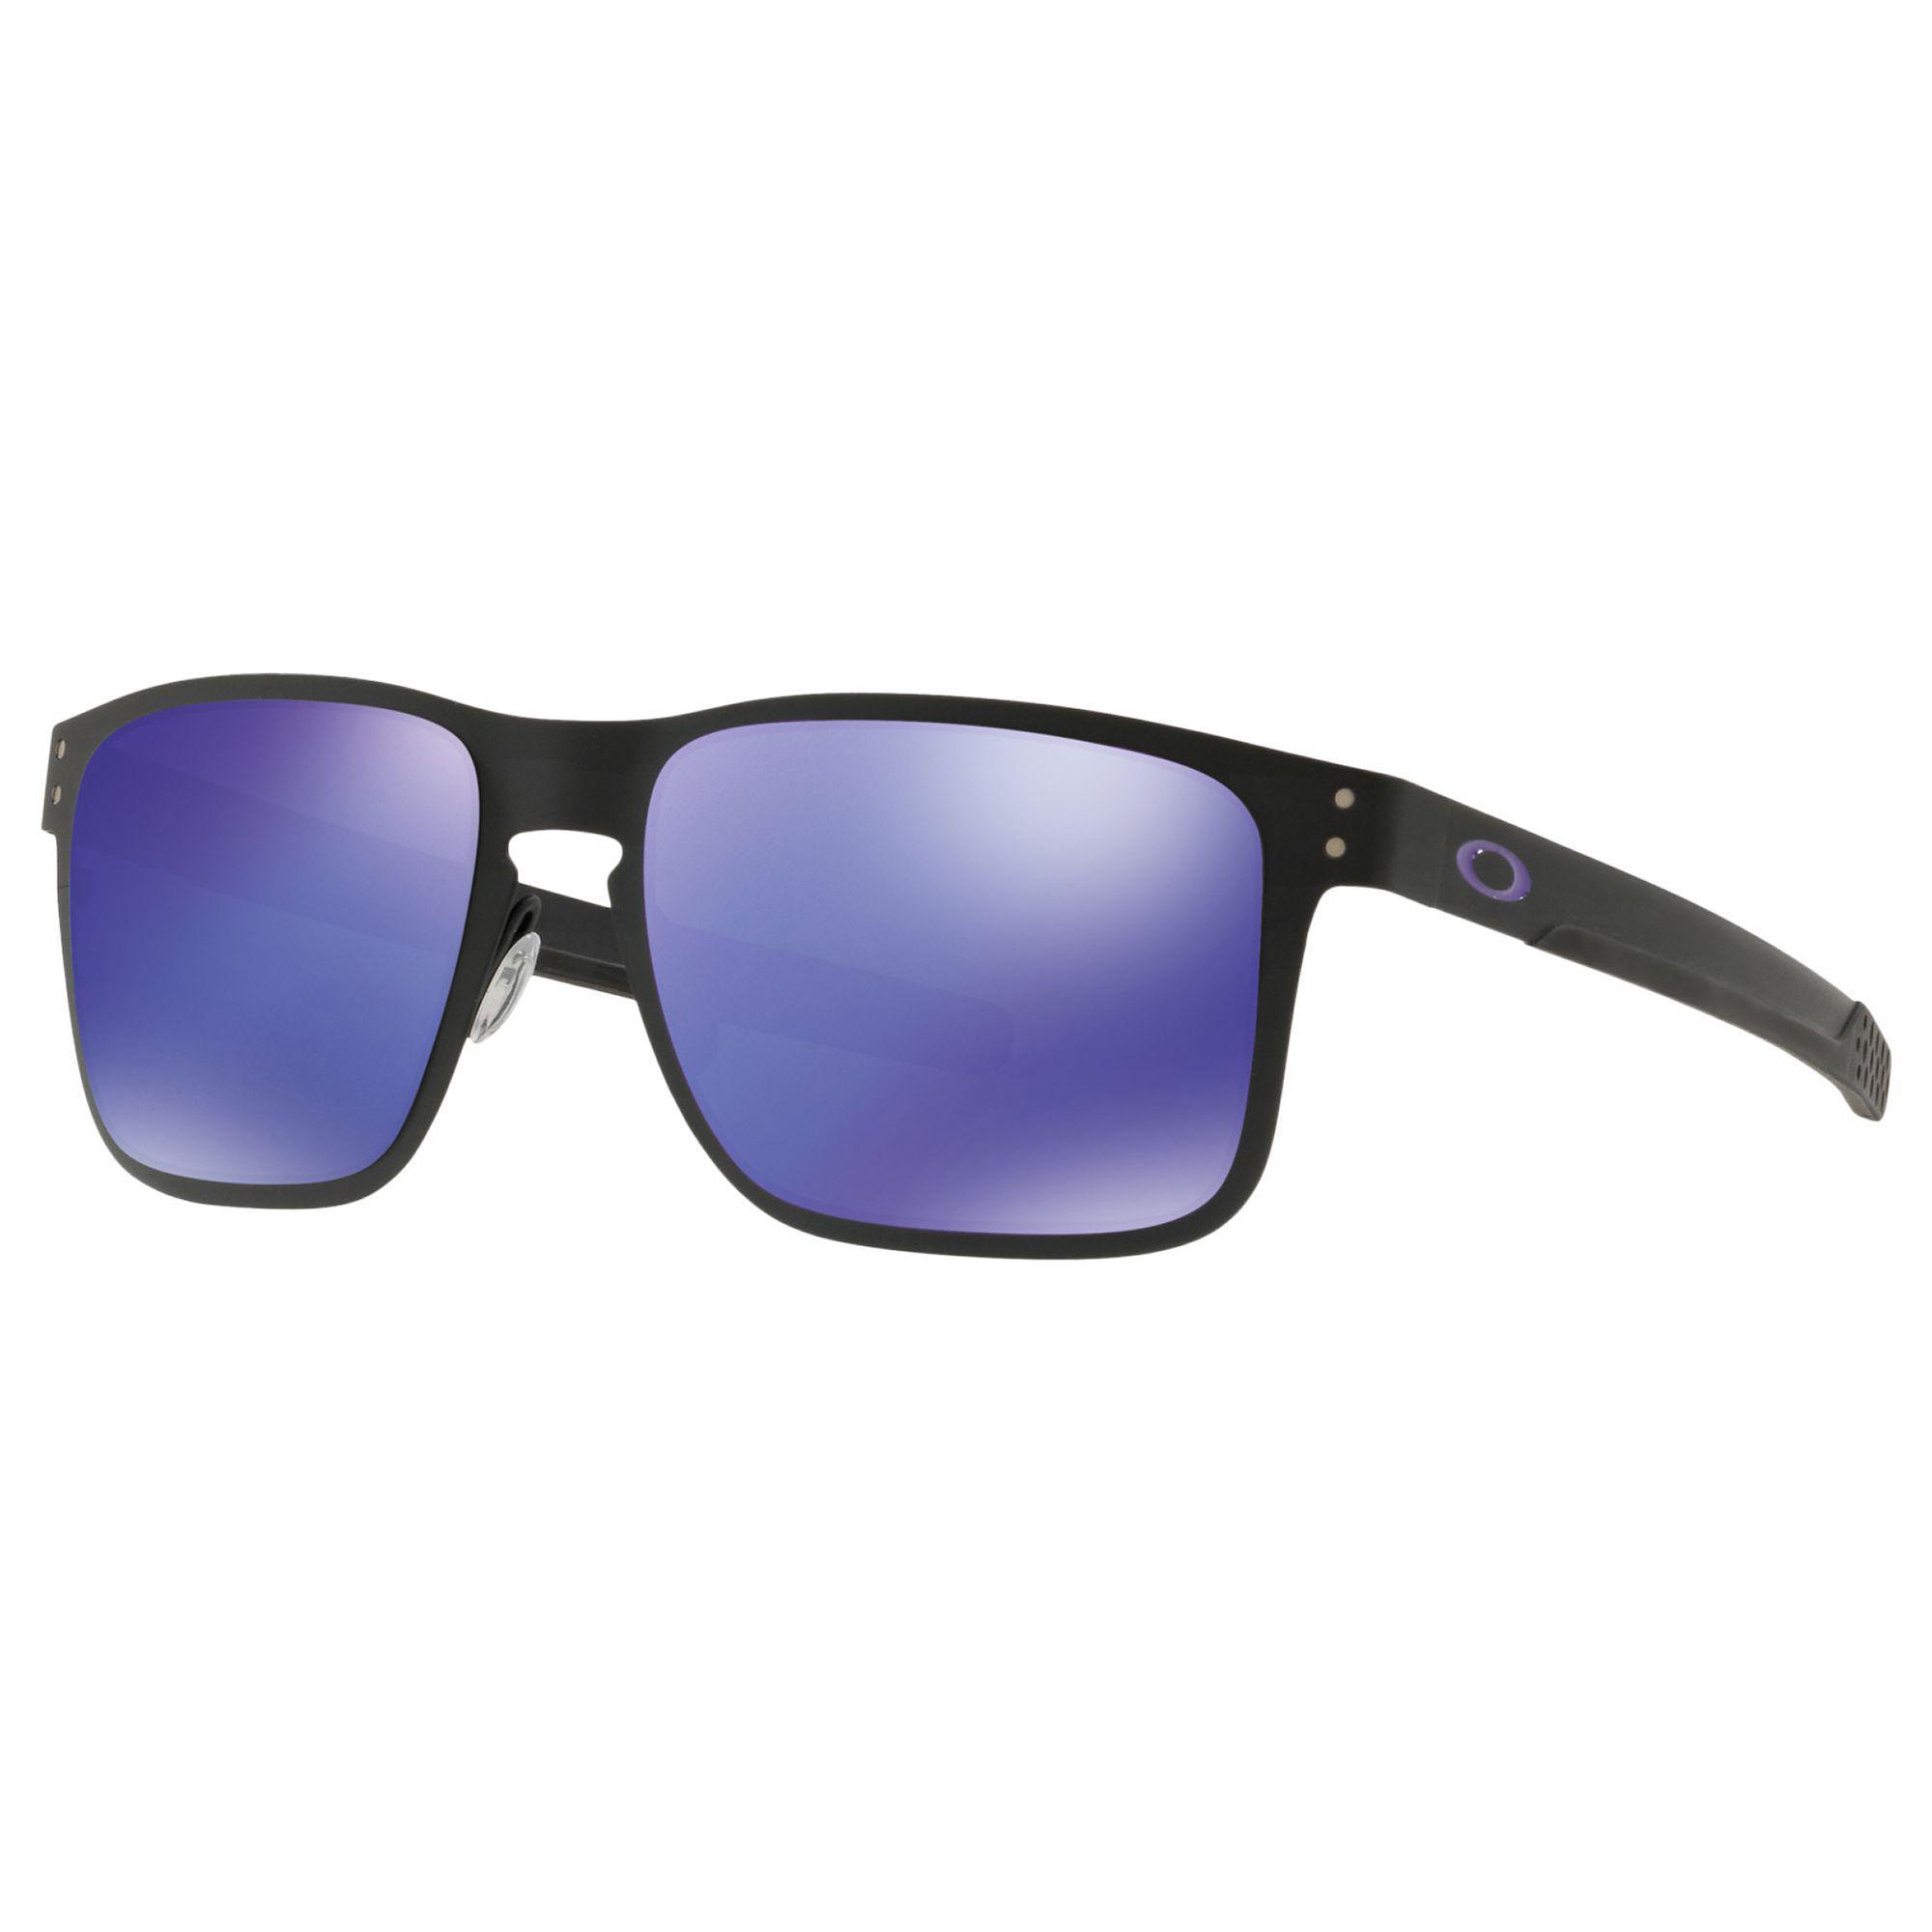 c28e0205bcc84 Oakley. Black Oo4123 Men s Holbrook Metal Square Sunglasses. £150 From John  Lewis ...